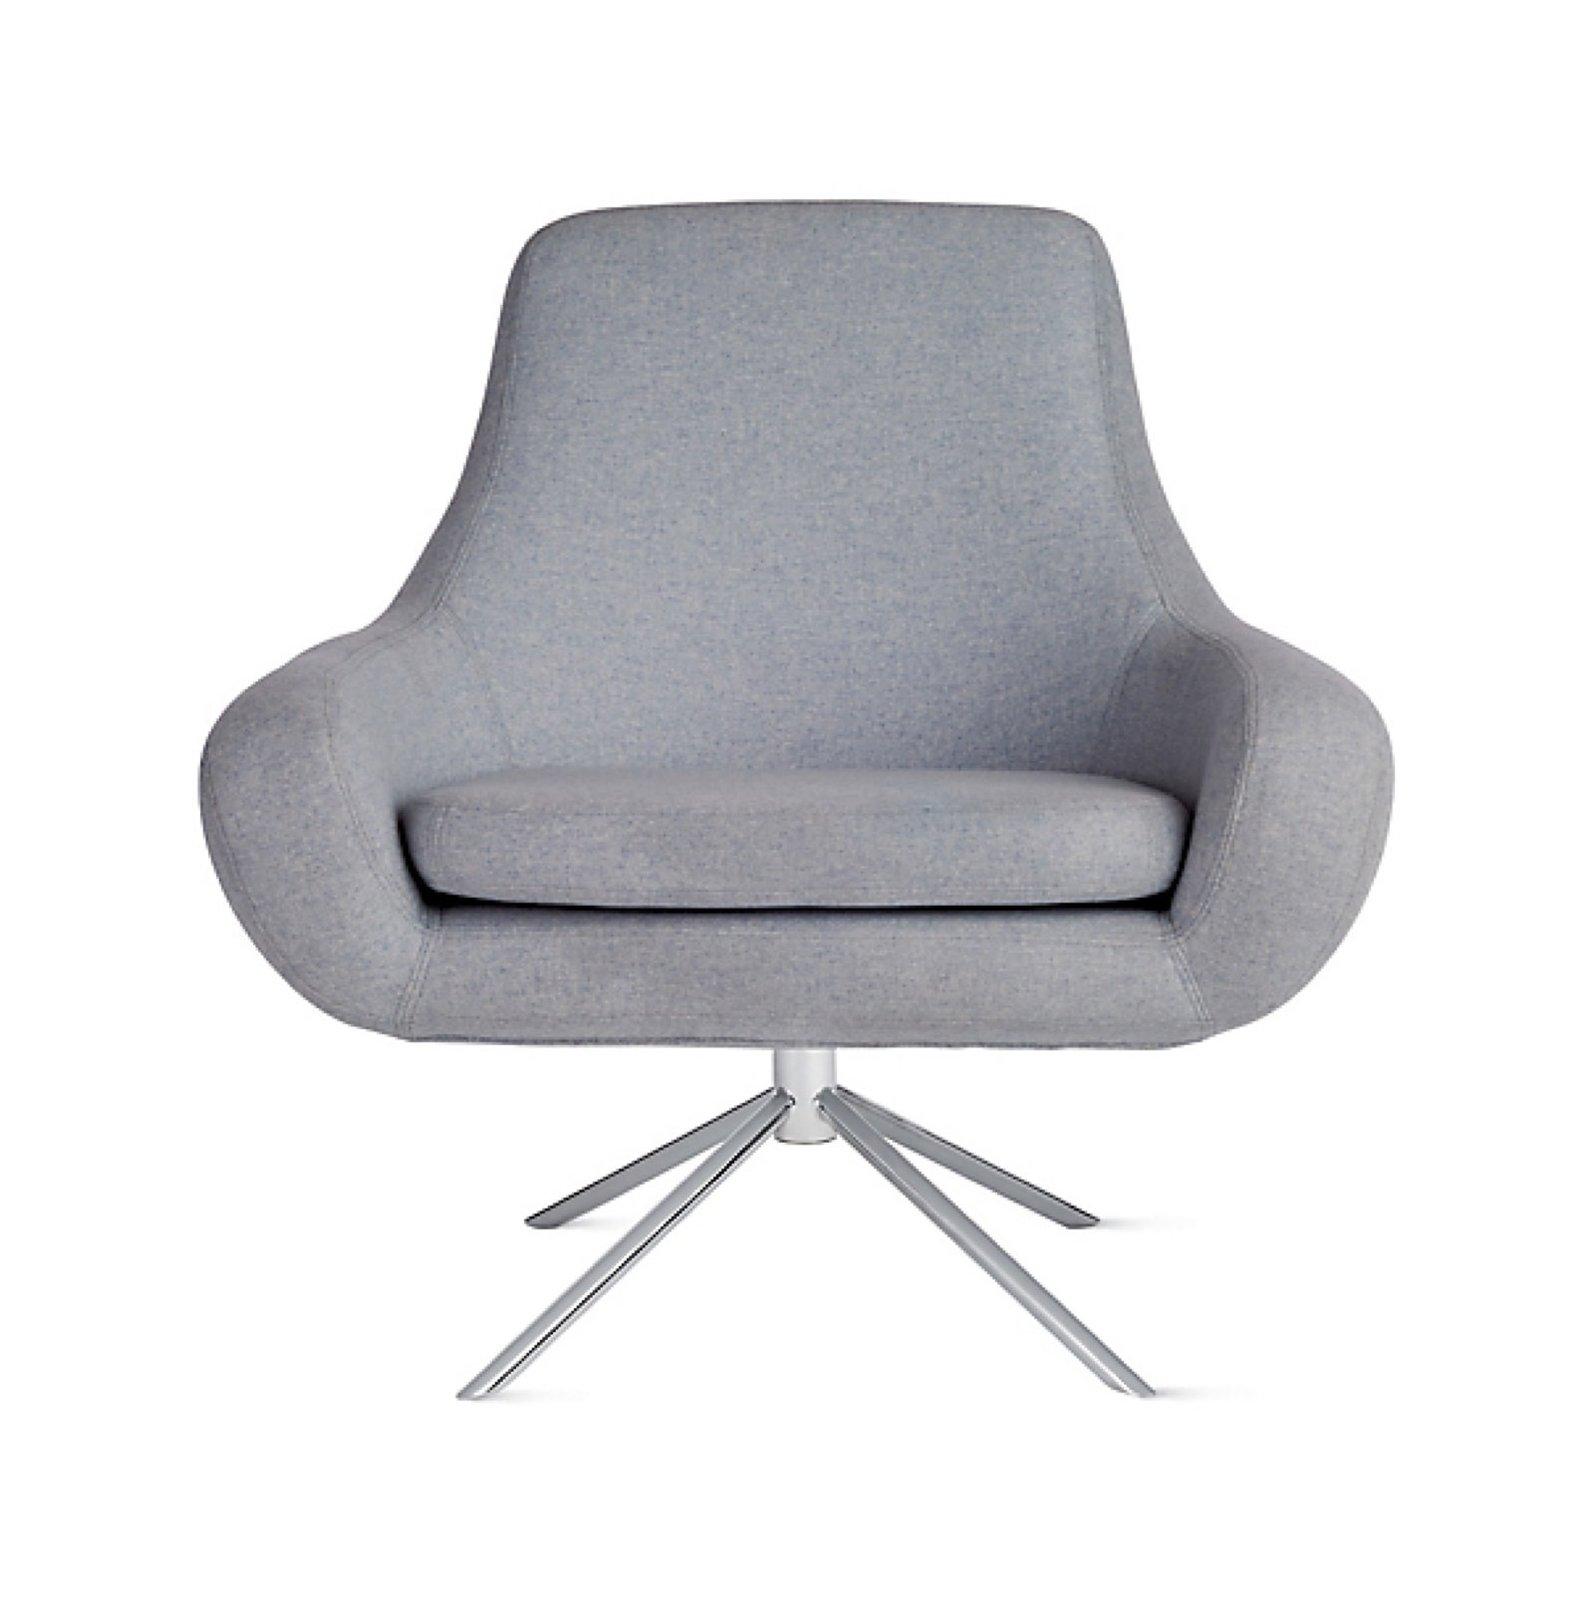 Photo 1 of 1 in Softline Noomi Swivel Chair